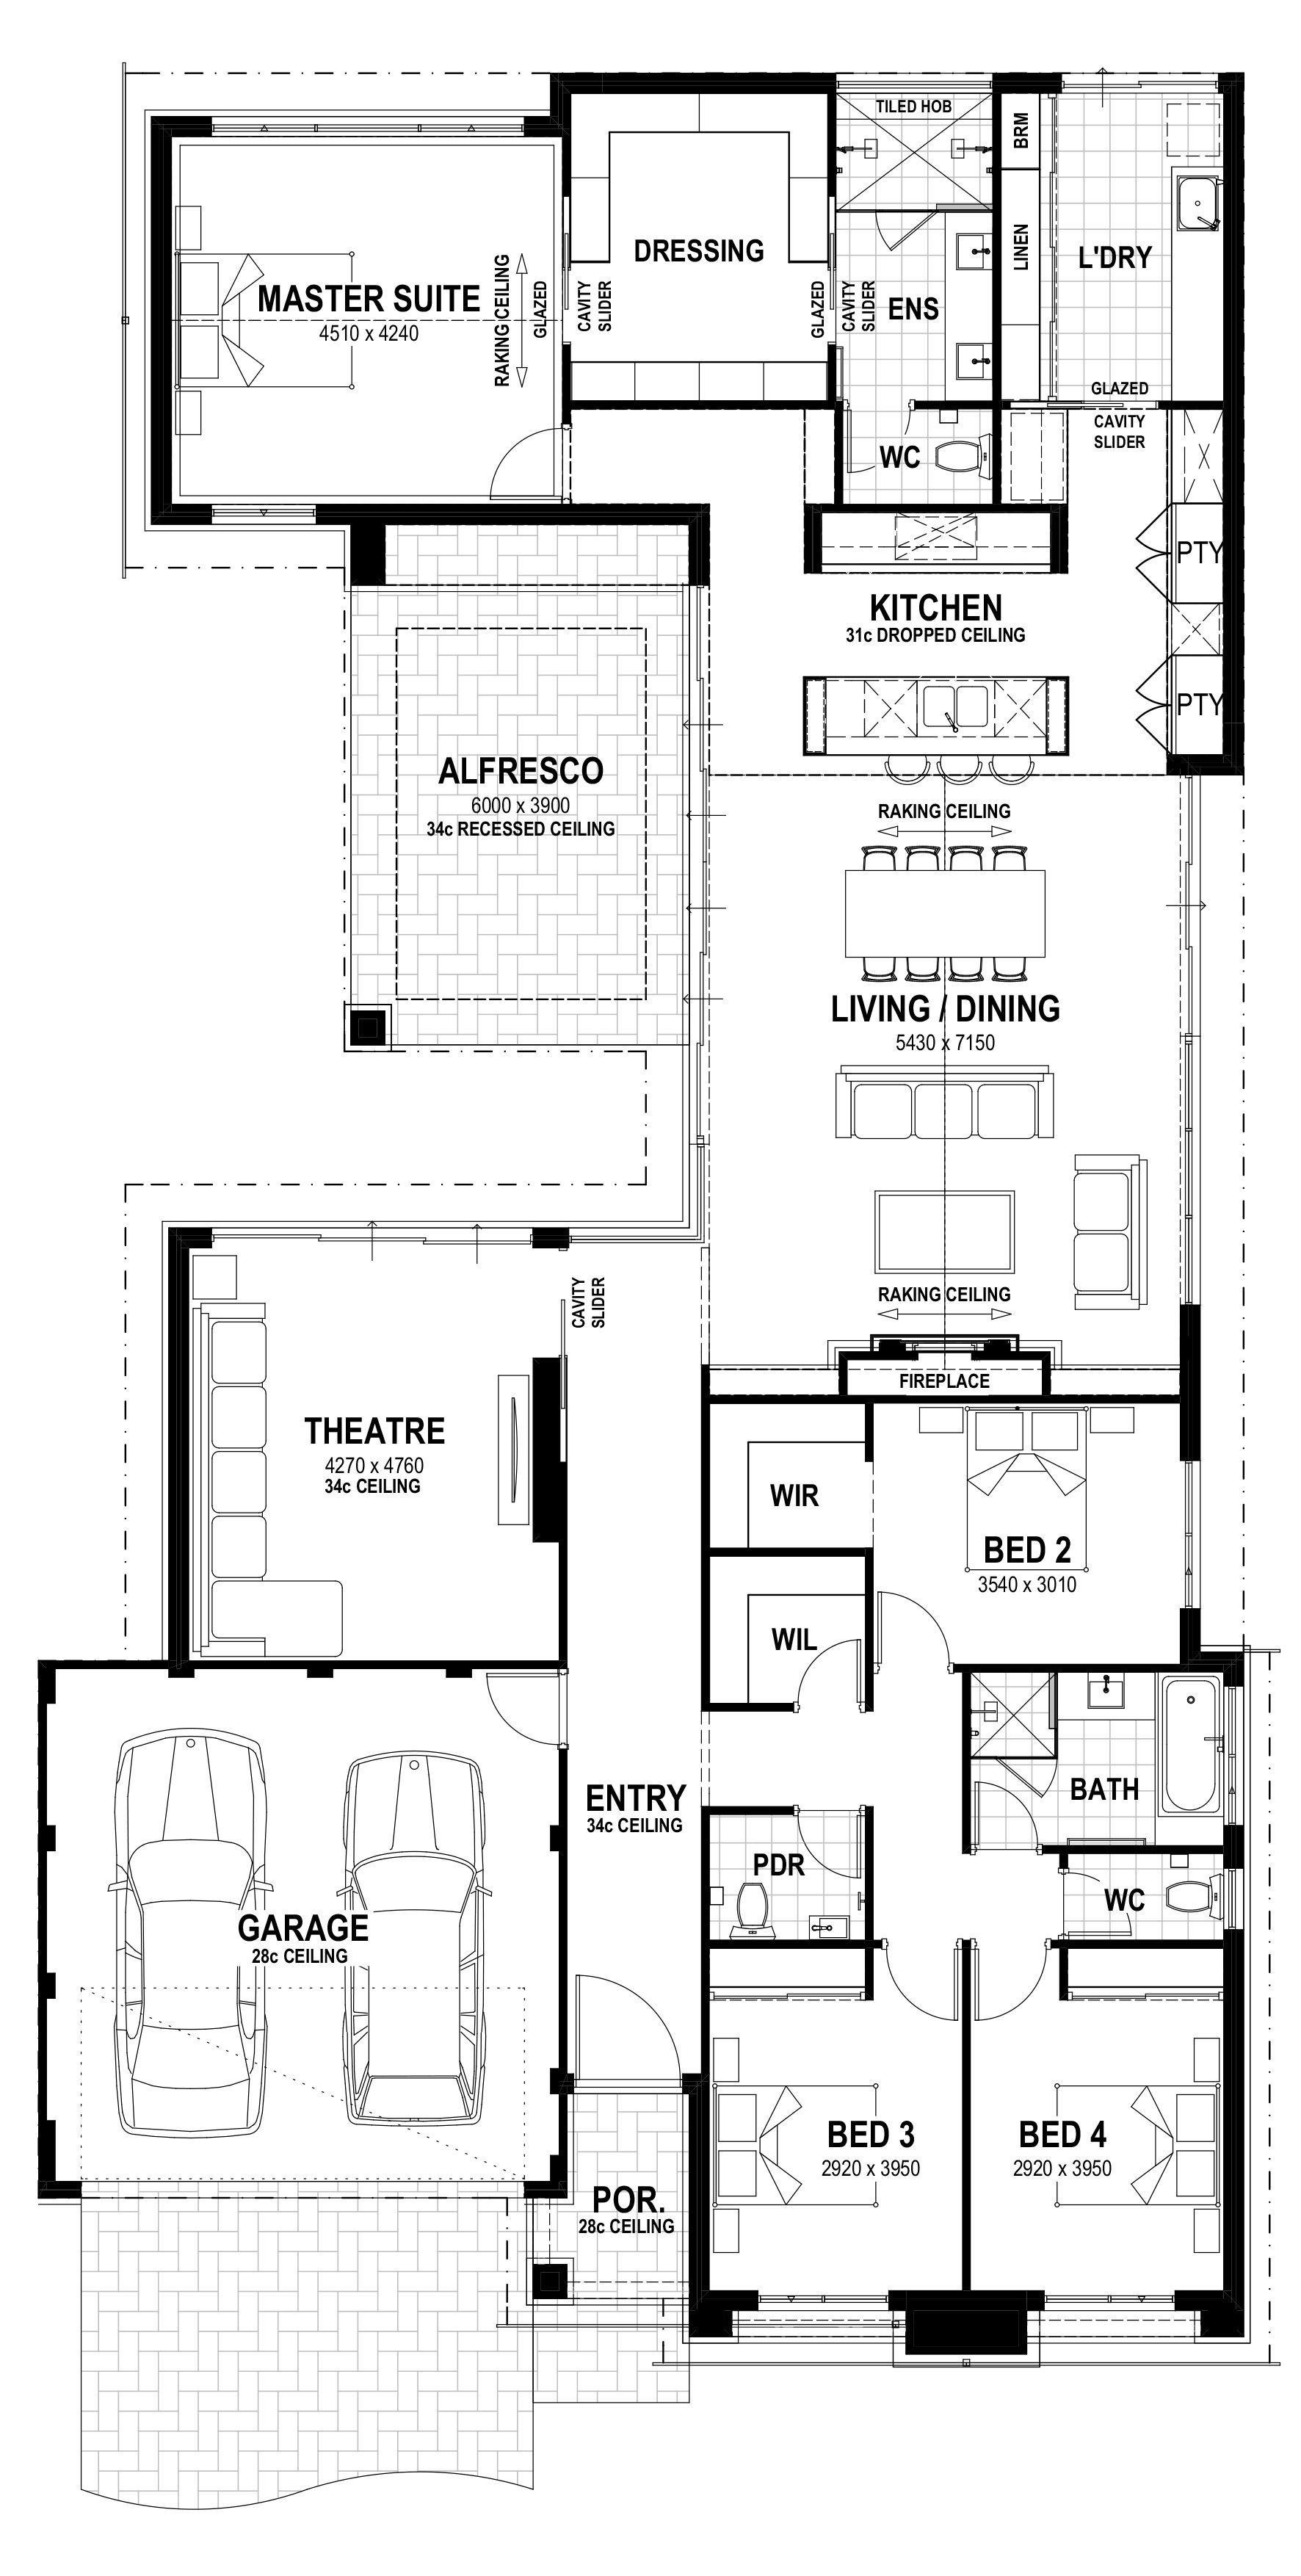 Dream Homes House Plans 2020 Dream House Plans House Flooring Home Design Floor Plans